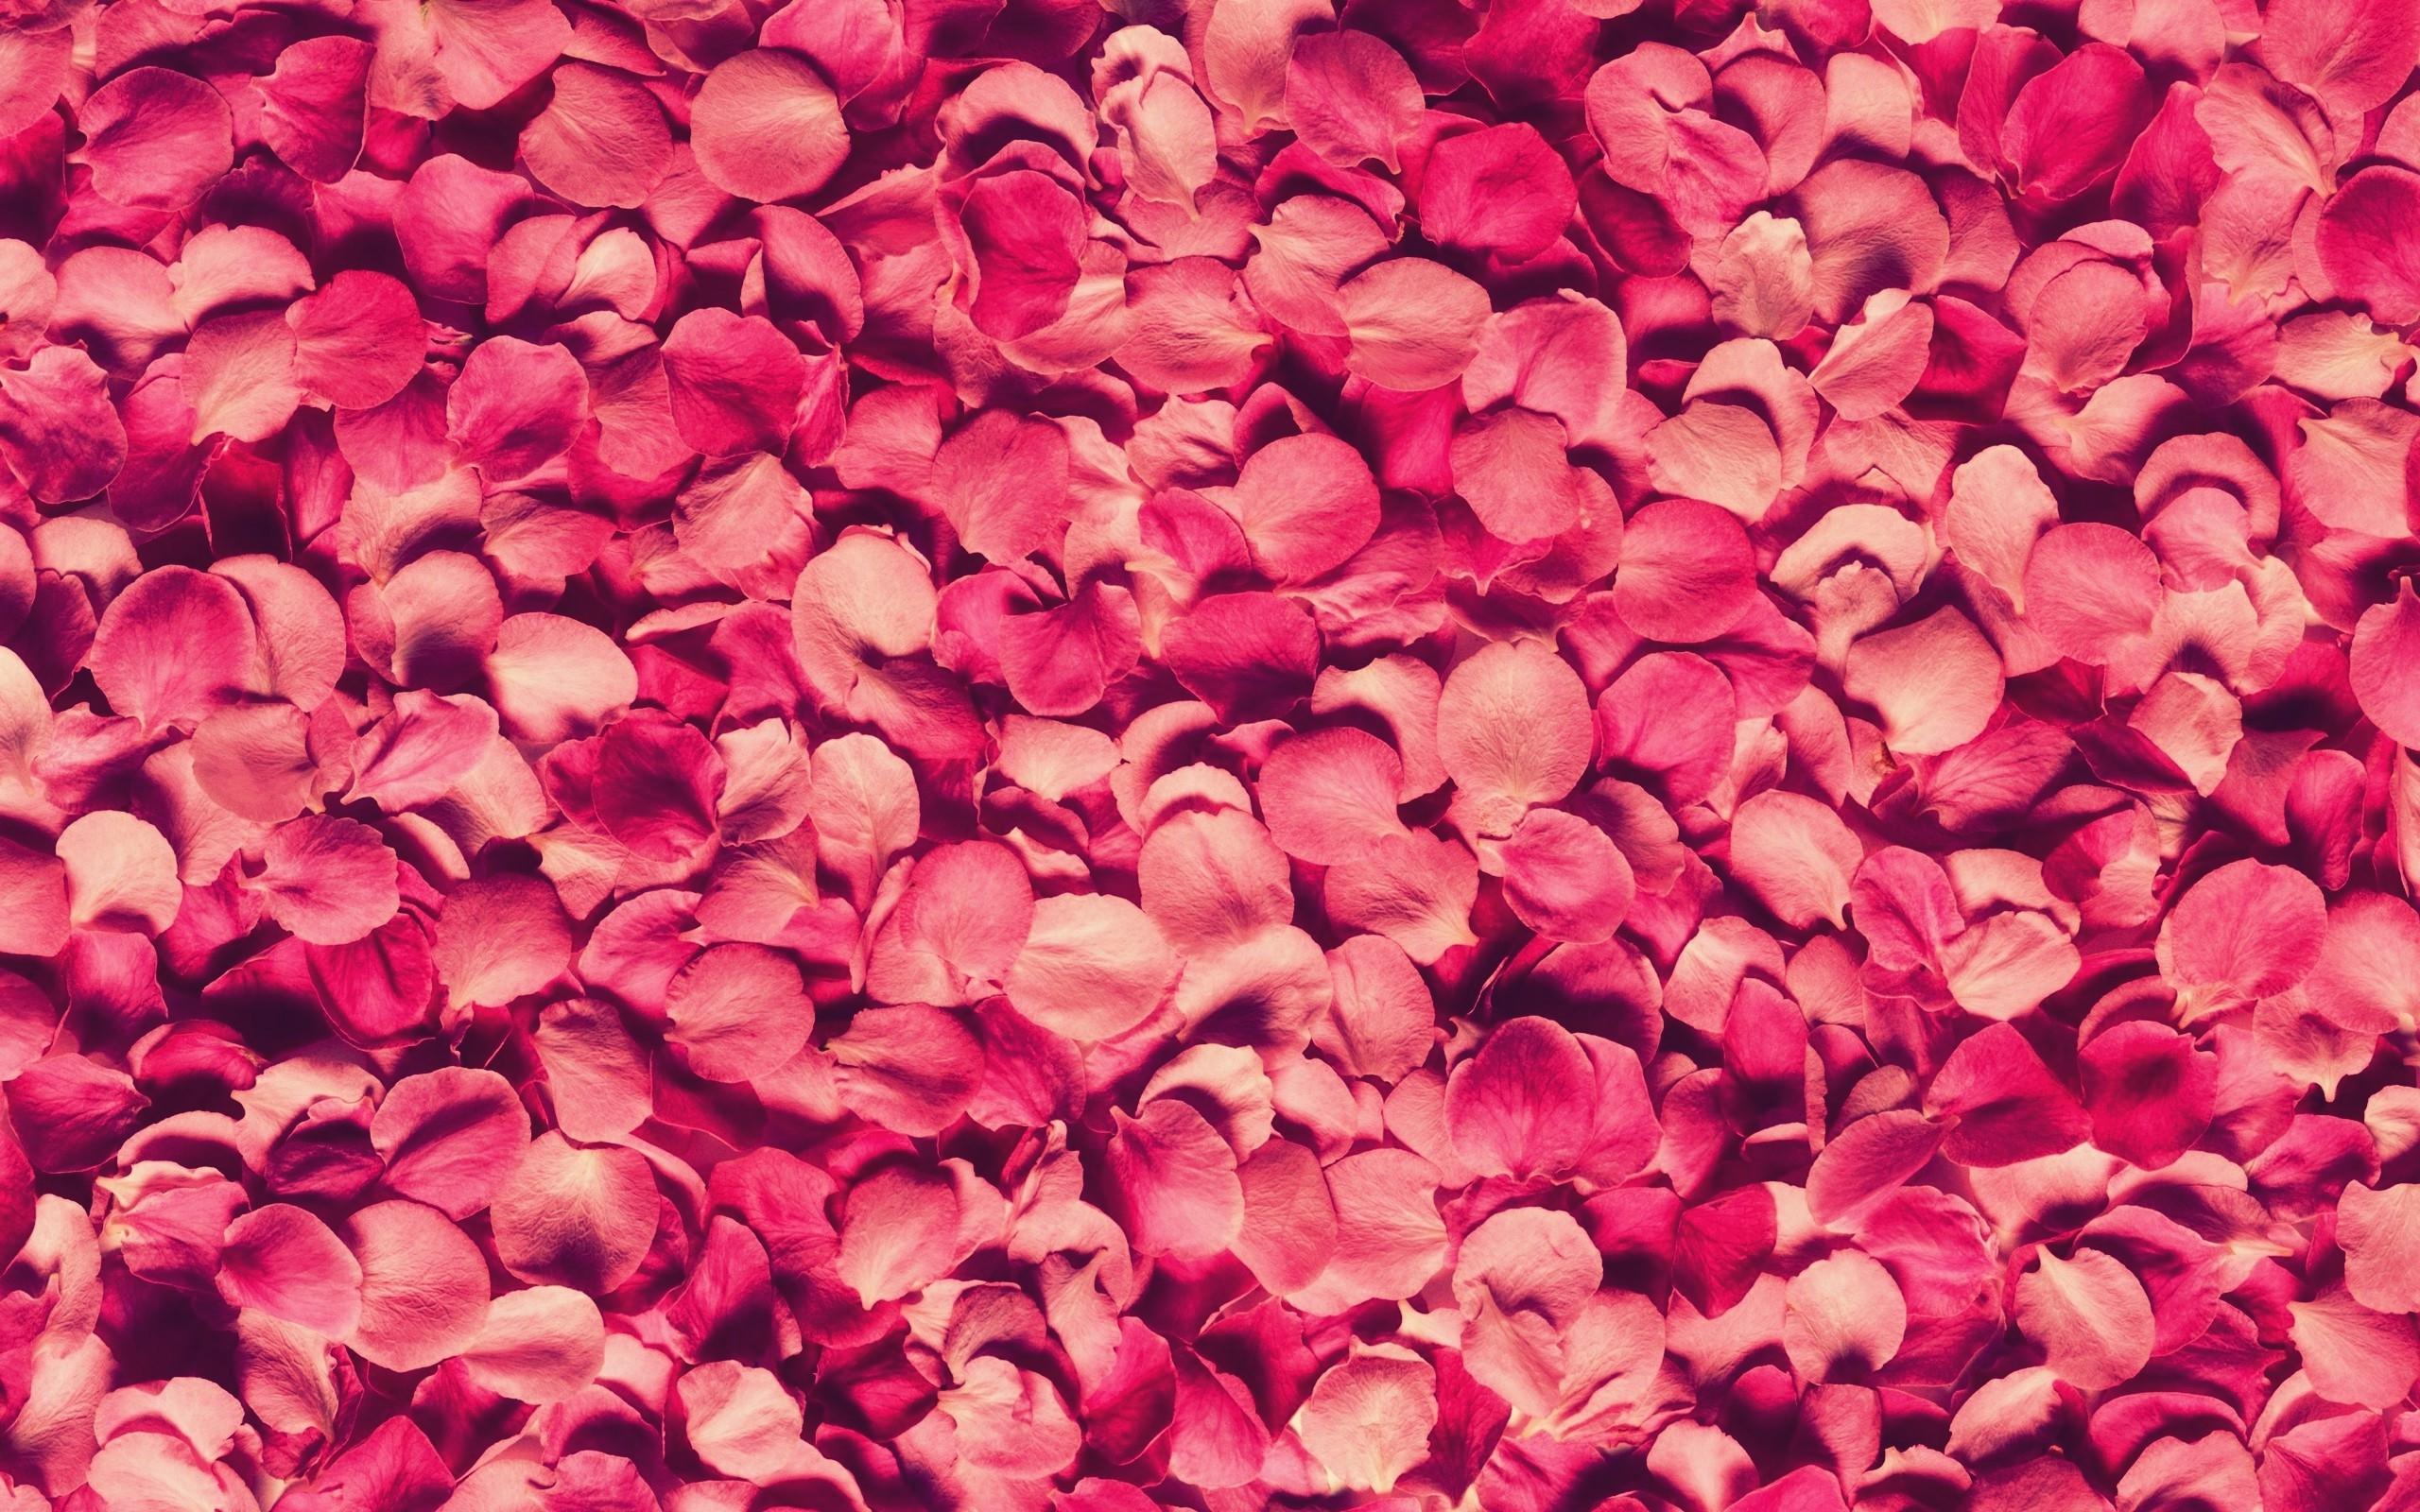 Fondos De Pantalla Rosa: Fondos De Pantalla : Rojo, Pétalos, Rosa, Textura, Rosado